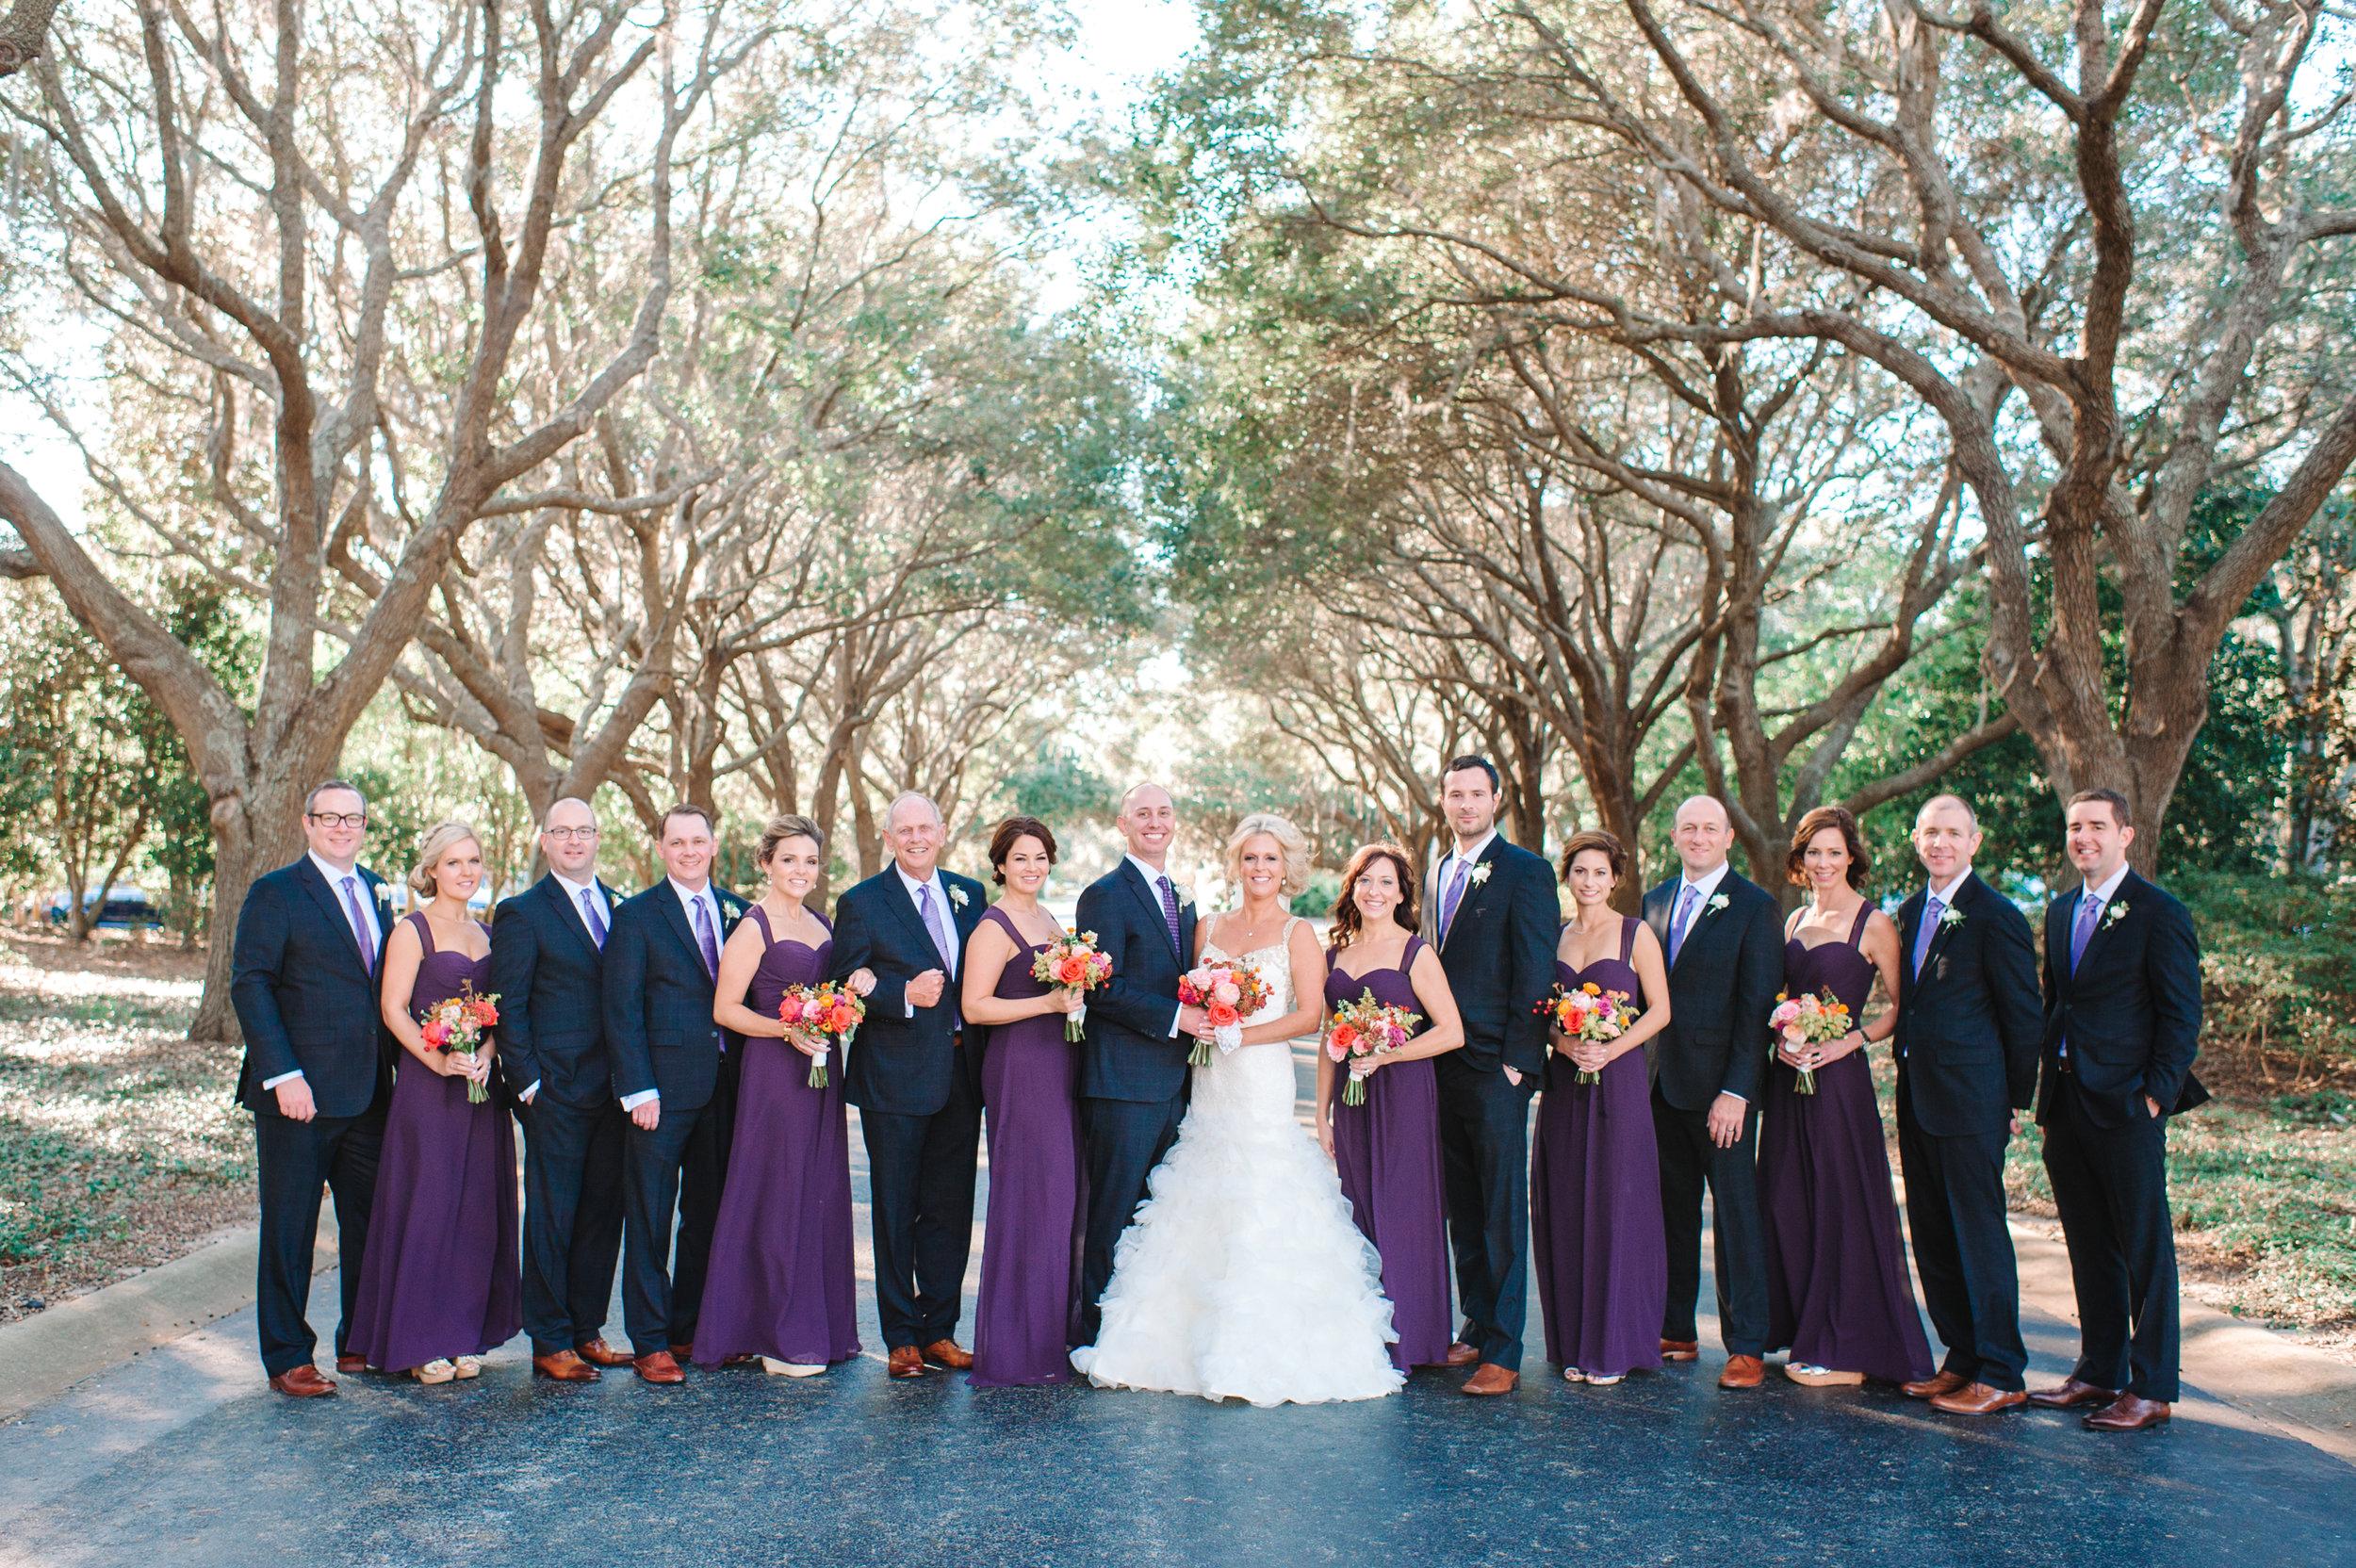 Jessica & John wedding at Debordieu Club by Pasha Belman Photography